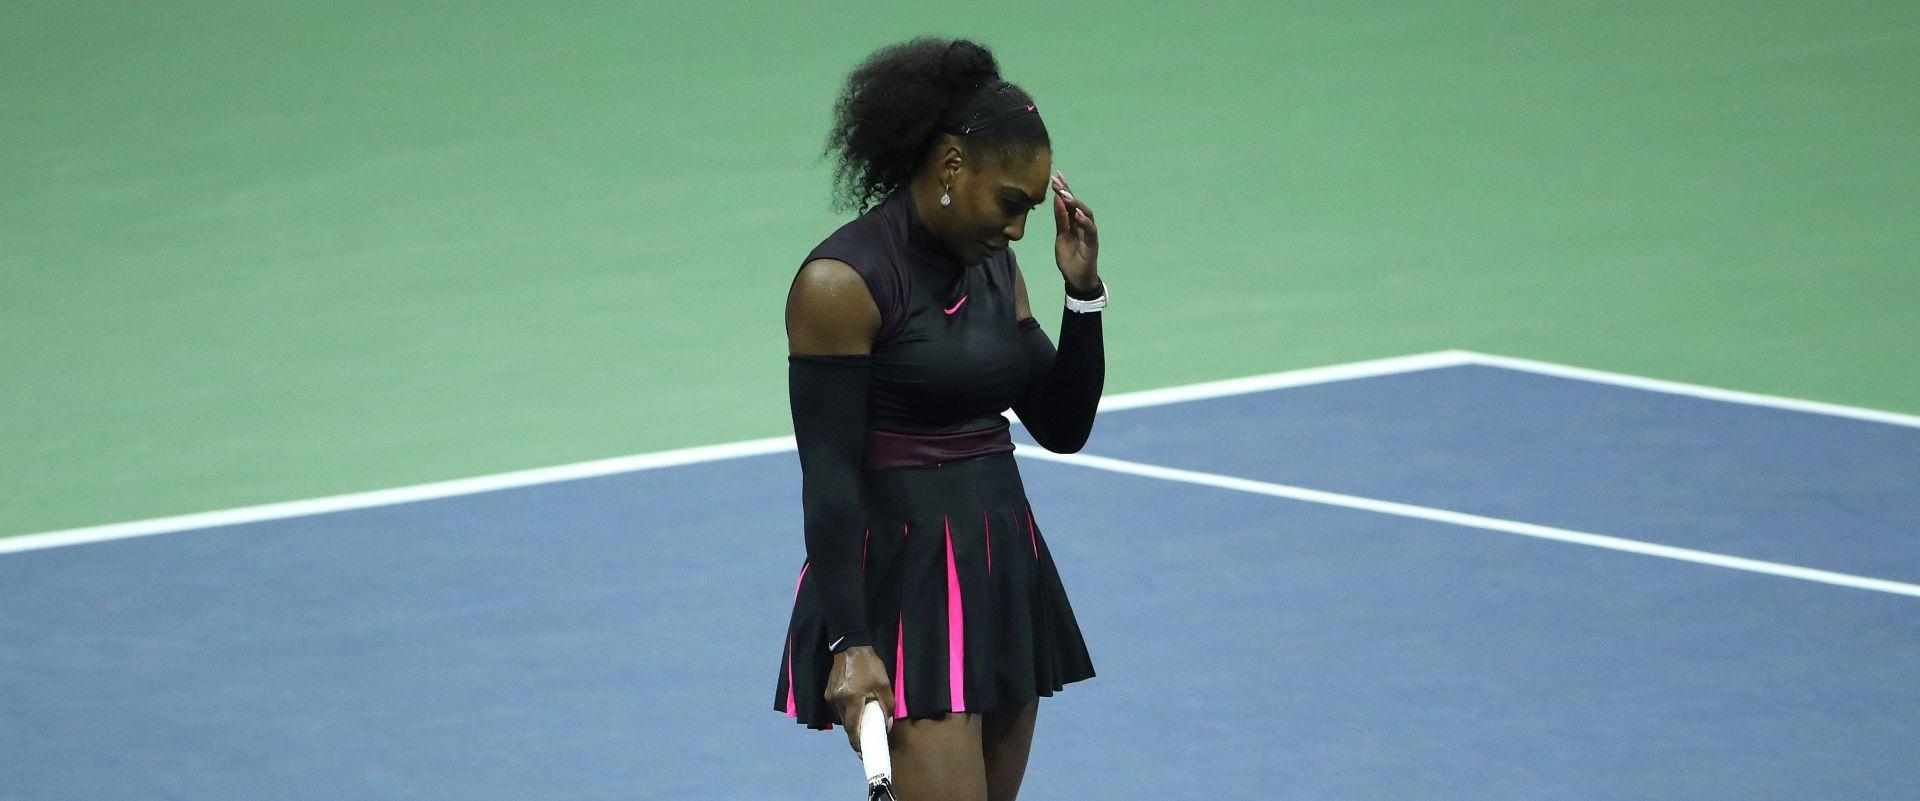 Serena Williams izgubila finale i broj 1 na WTA ljestvici, za titulu na US Openu bore se Pliškova i Kerber